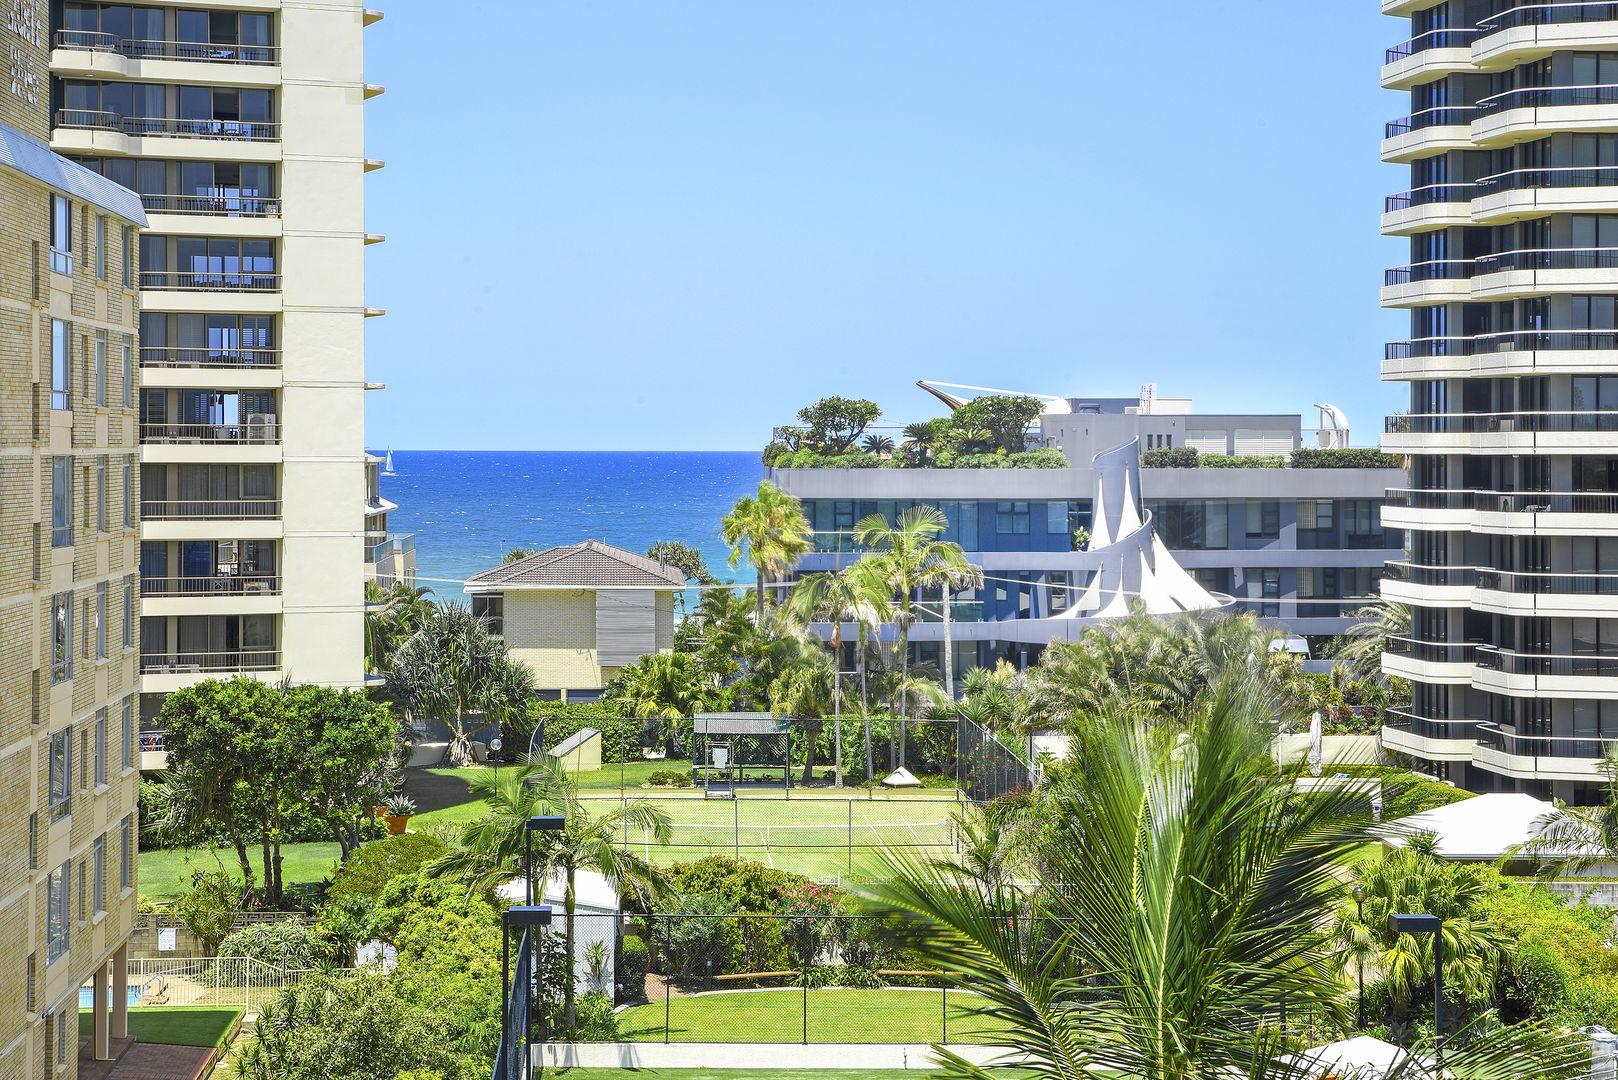 63/1 'Contessa' Serisier Ave, Main Beach QLD 4217, Image 0